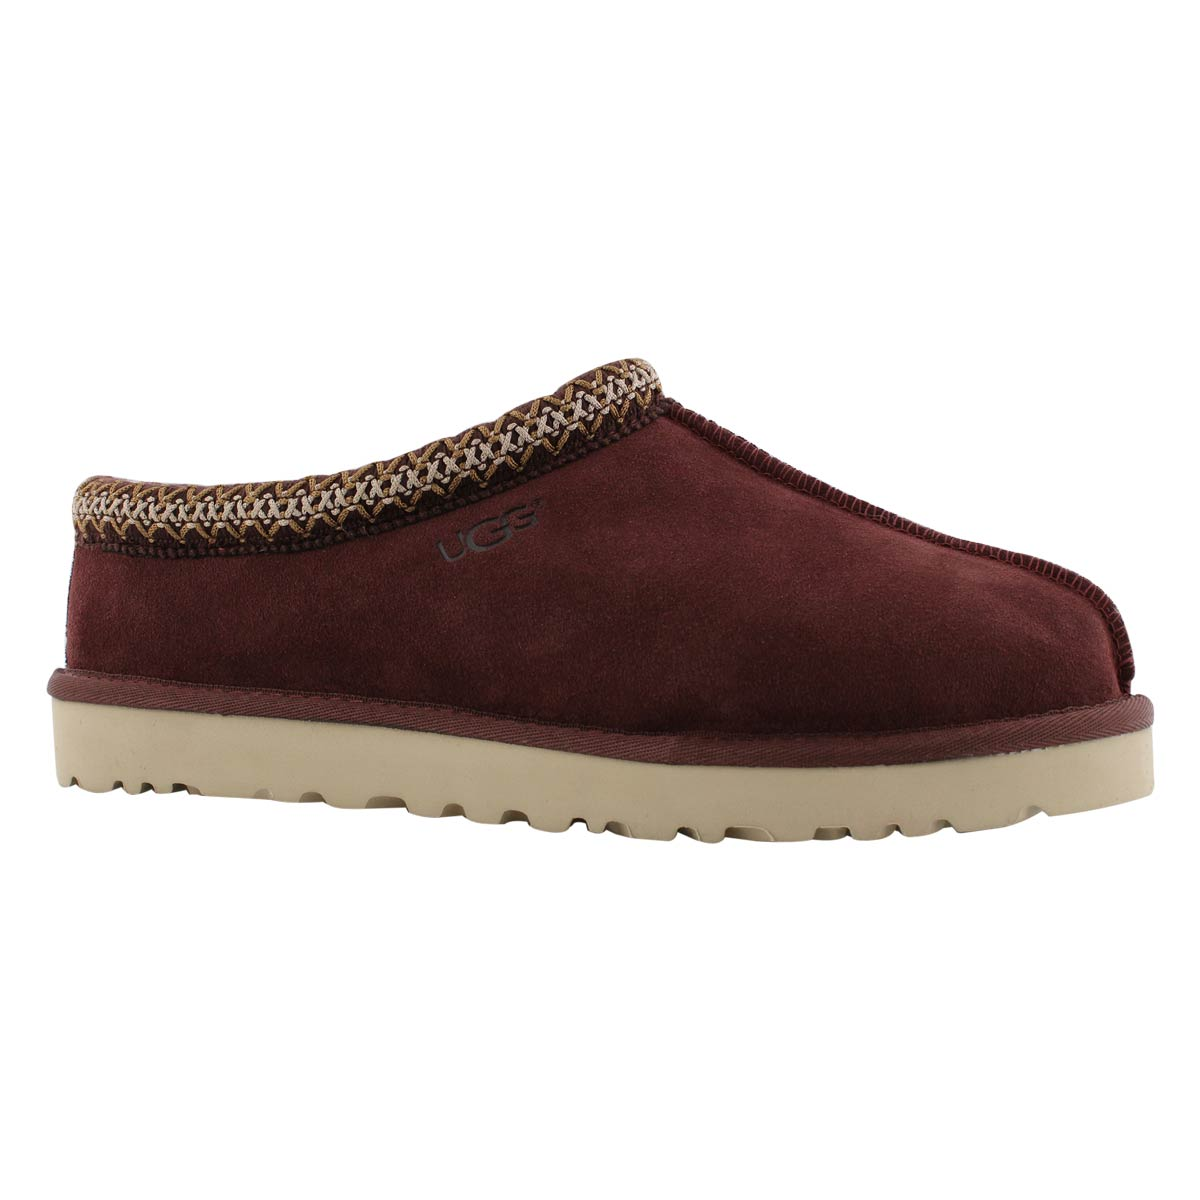 d4ae24419da Men's TASMAN burgundy sheepskin slippers